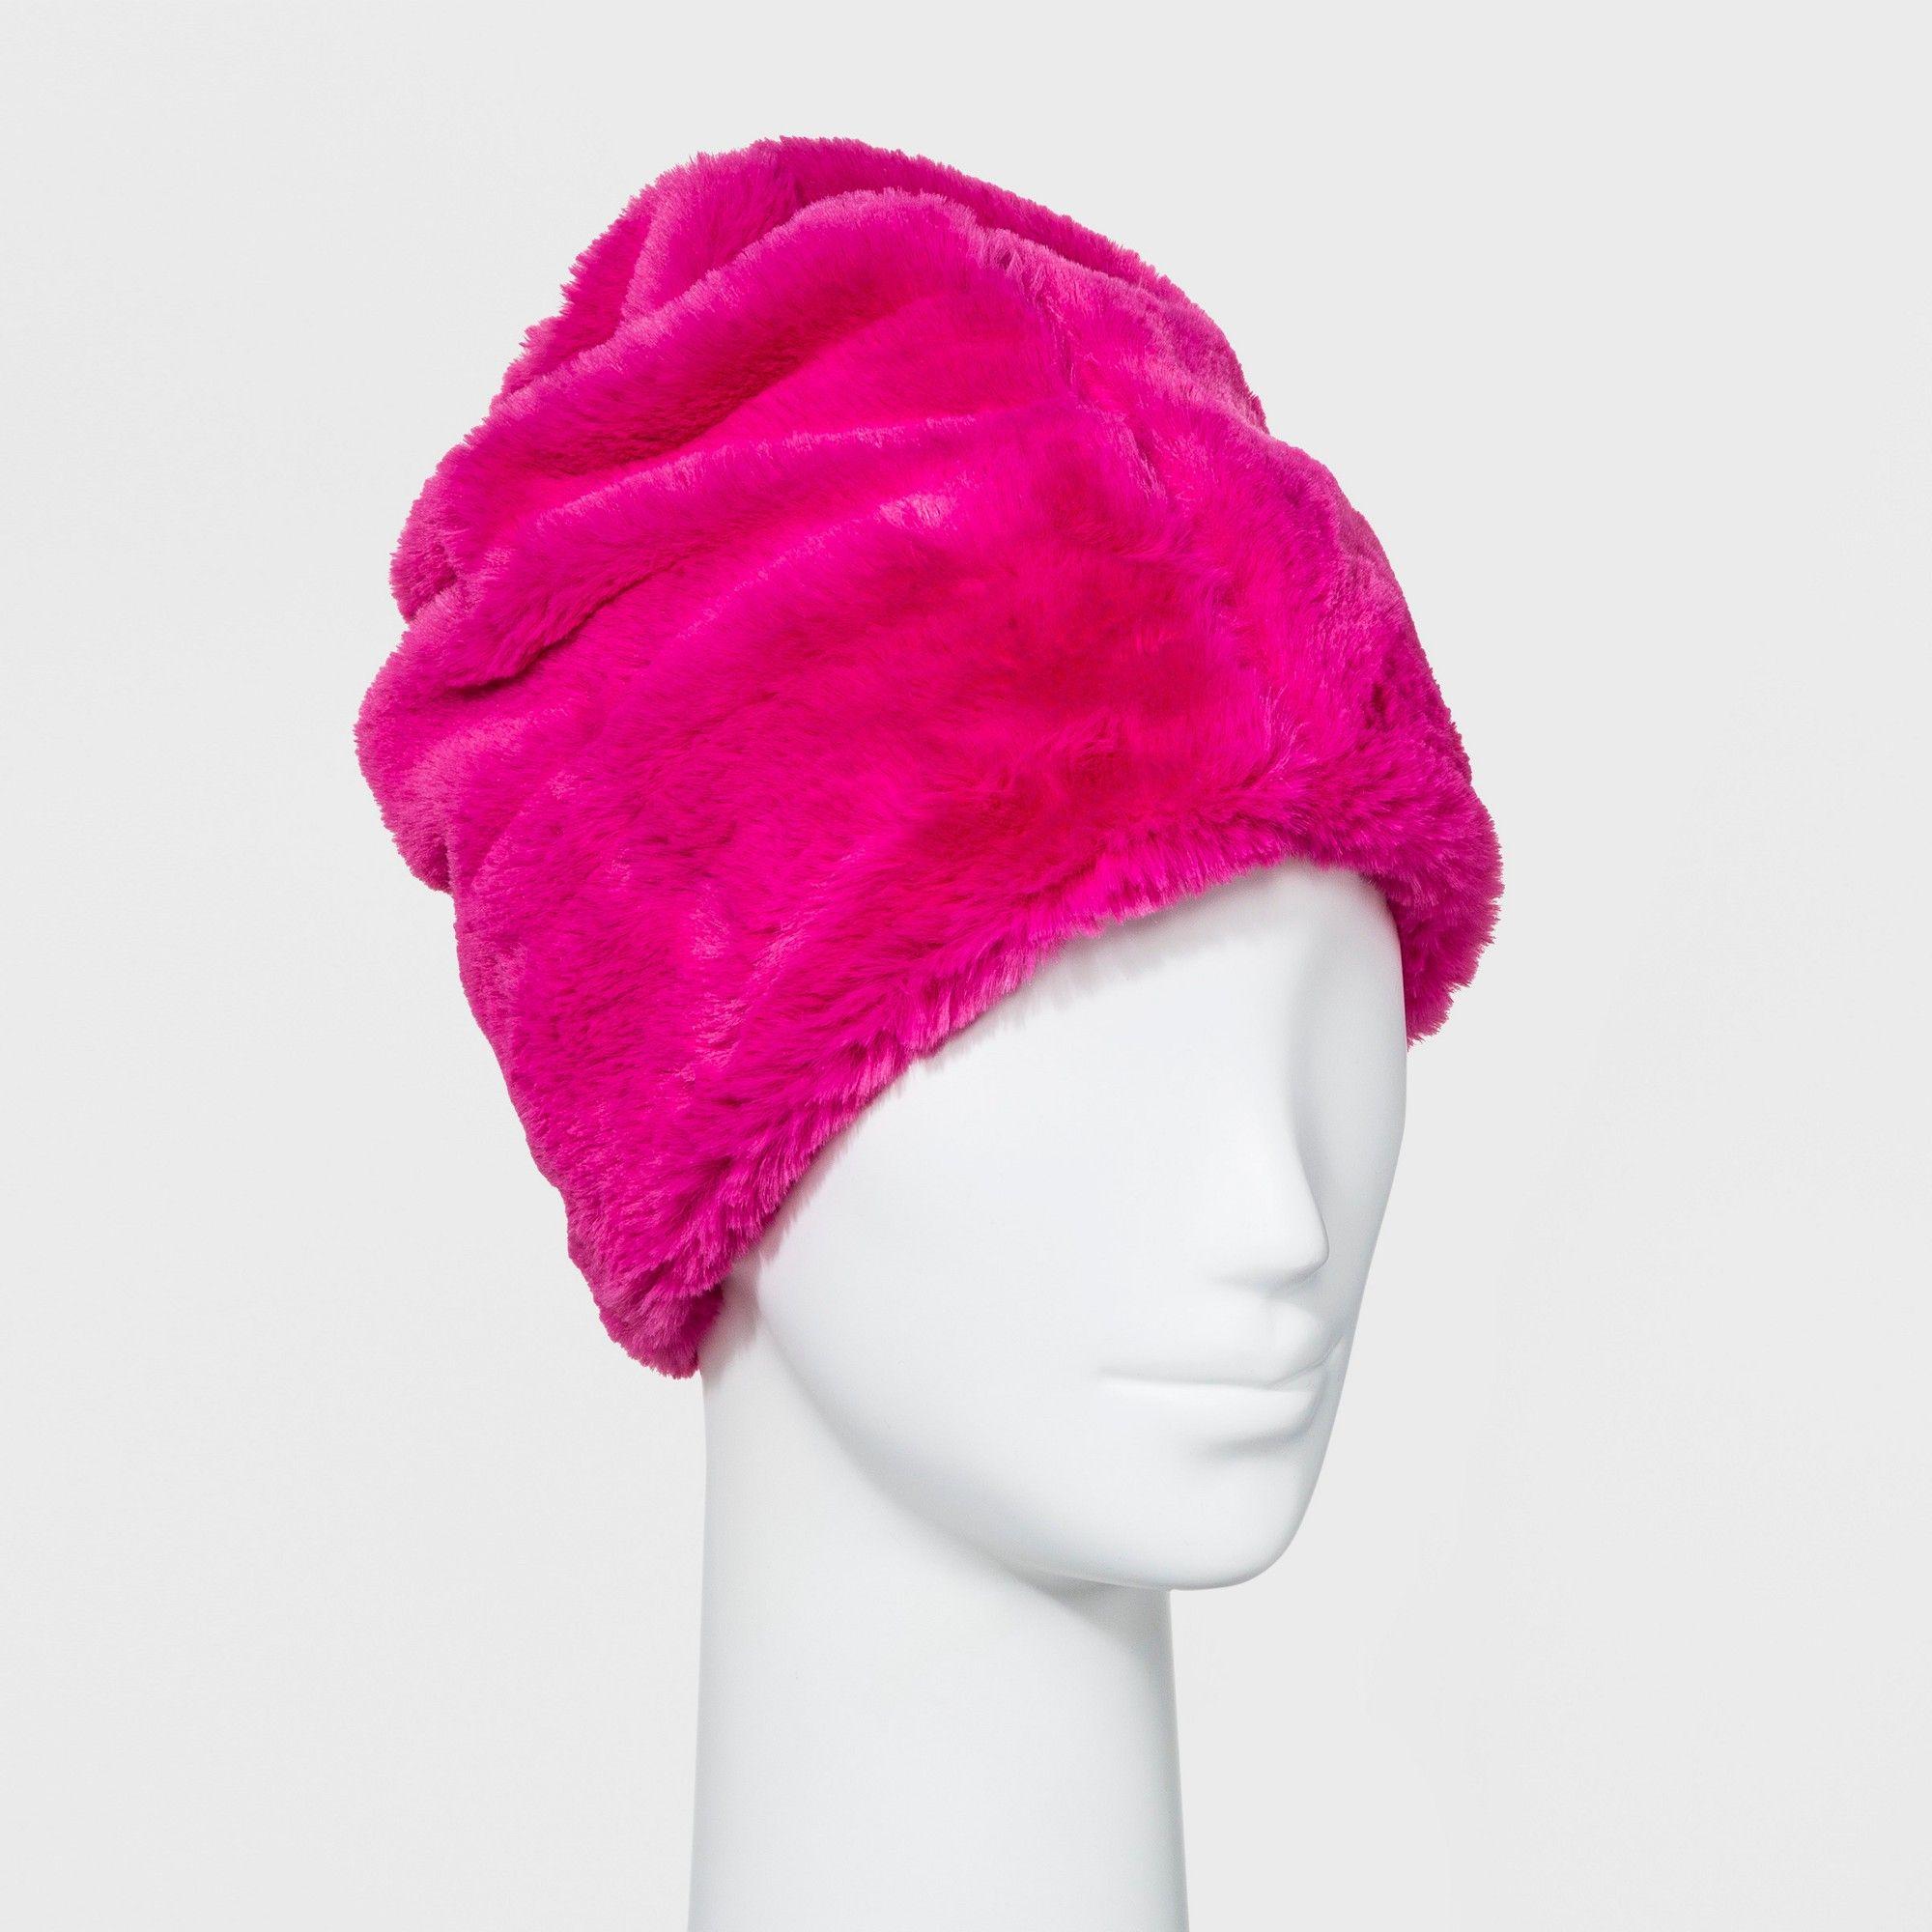 8f1647e01d3e Women s Faux Fur Beanie - Wild Fable Pink